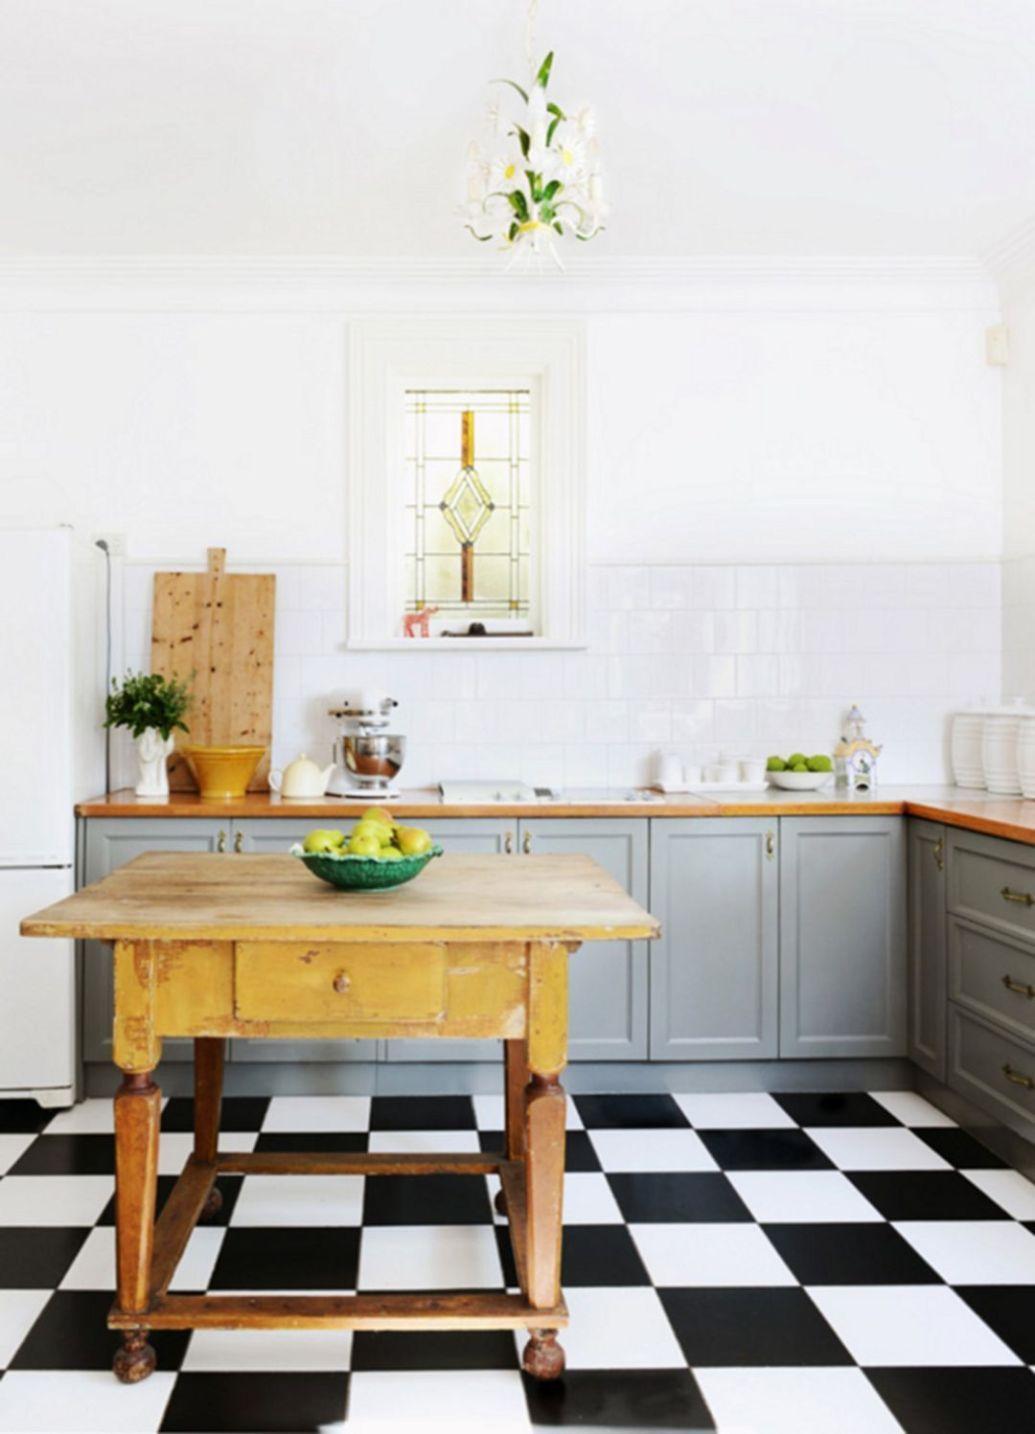 Elegant black and white floor tile color ideas 0500